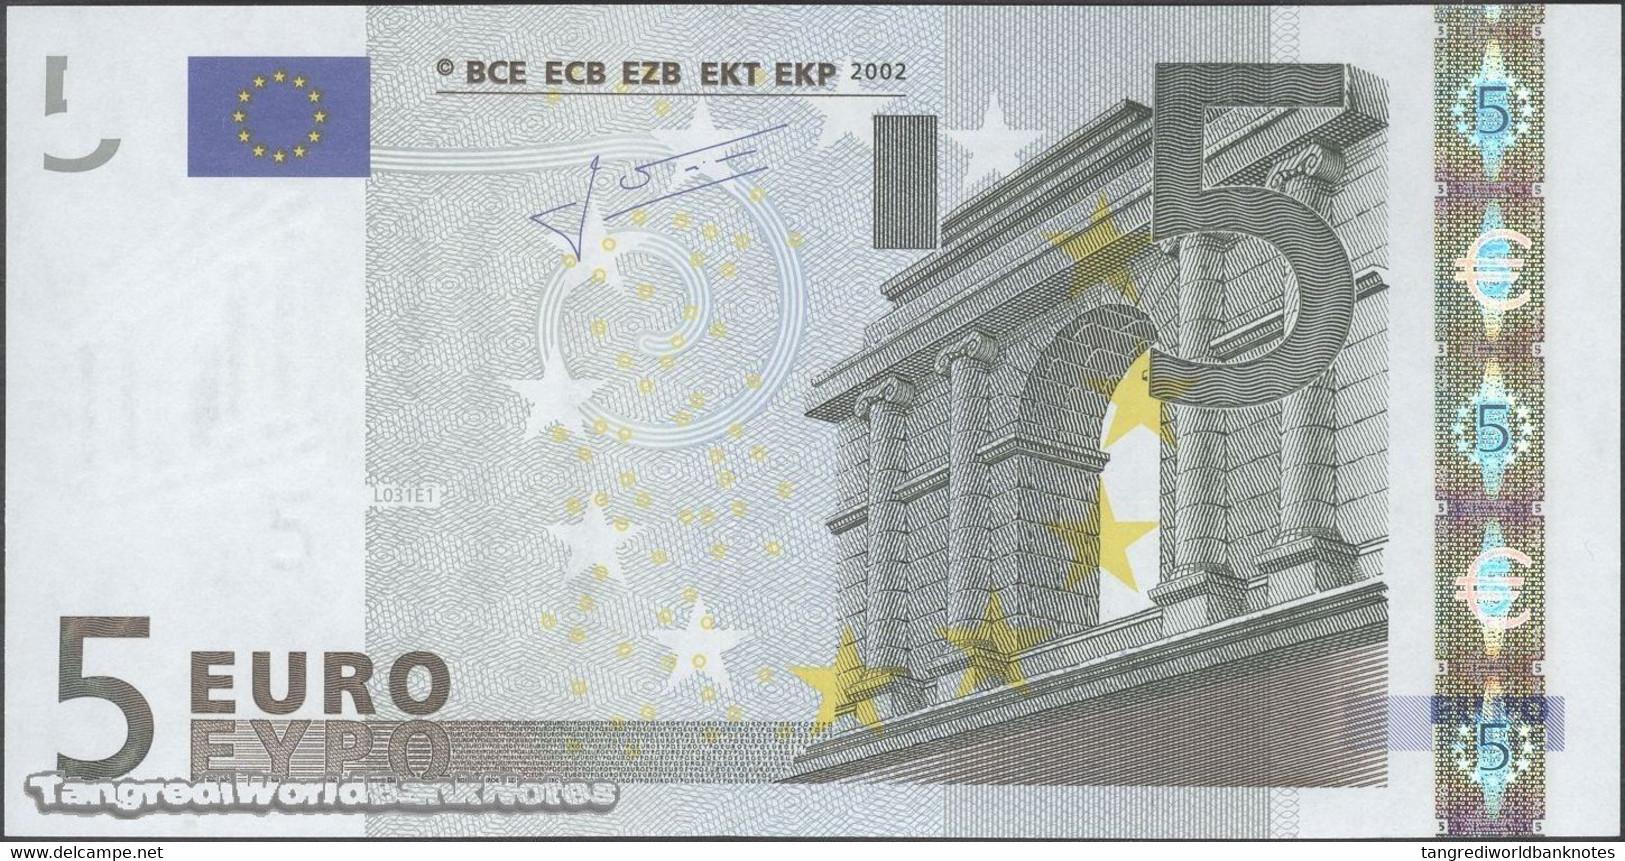 TWN - FRANCE 8U - 5 Euro 2003 Prefix U - Plate L031E1 - Signature: Trichet UNC - EURO